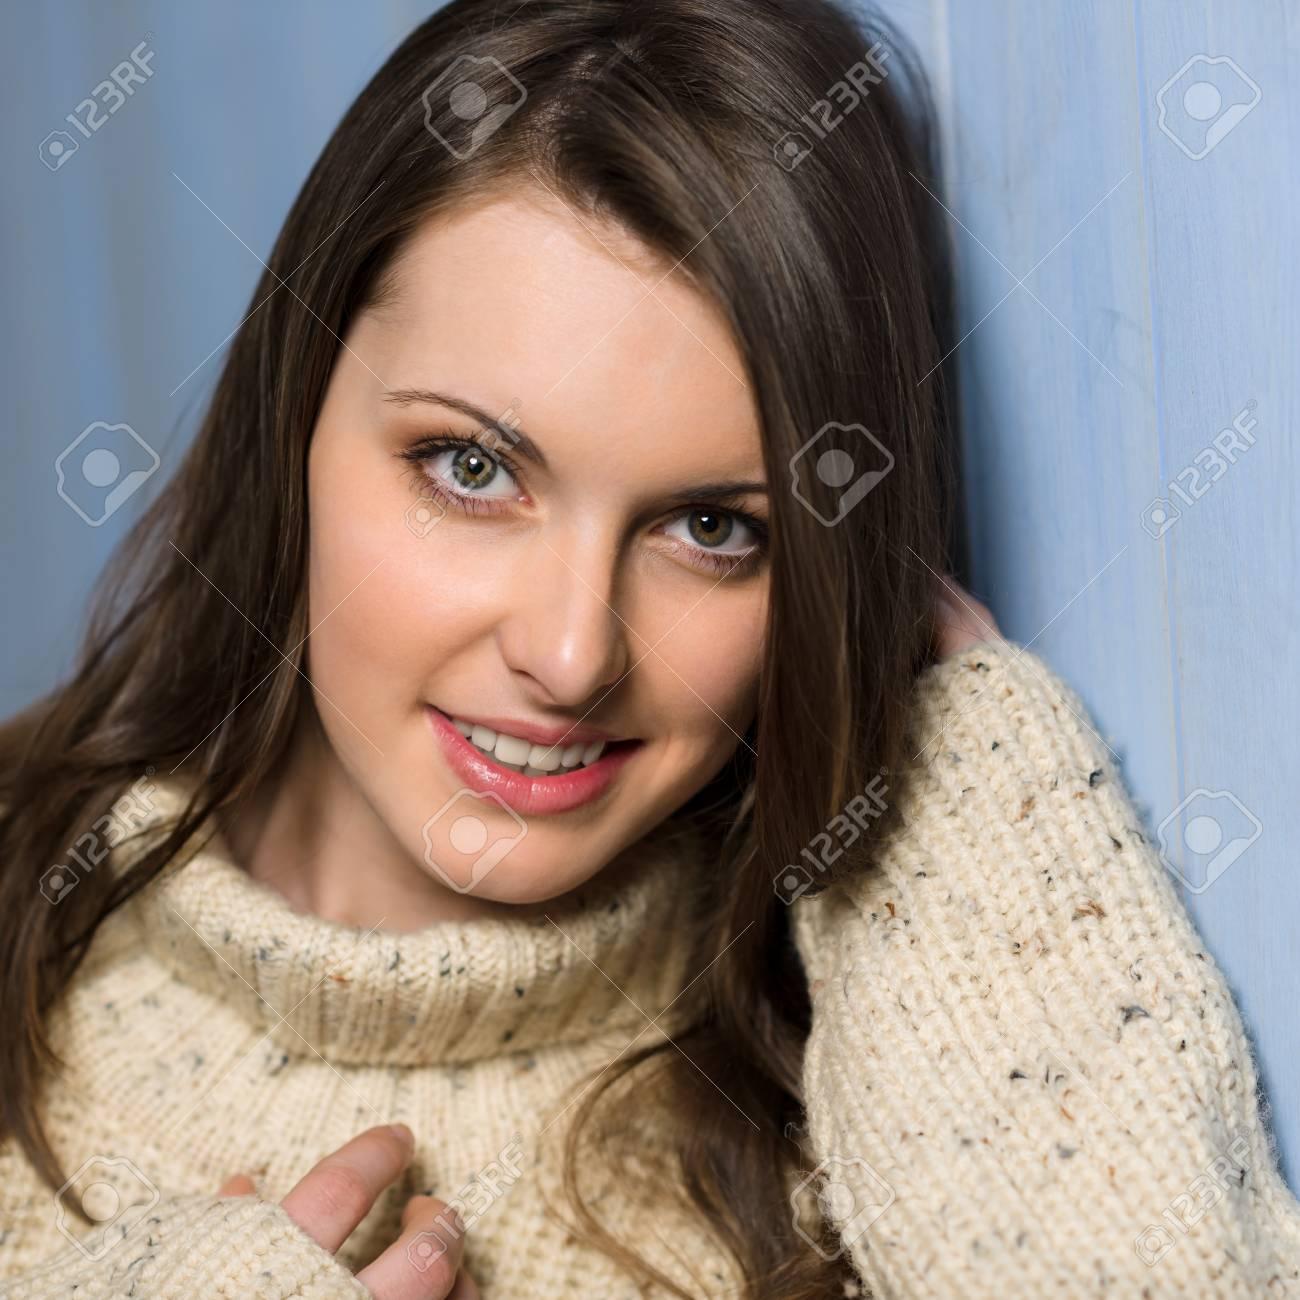 Beautiful smiling winter woman wearing beige sweater portrait Stock Photo - 13556234